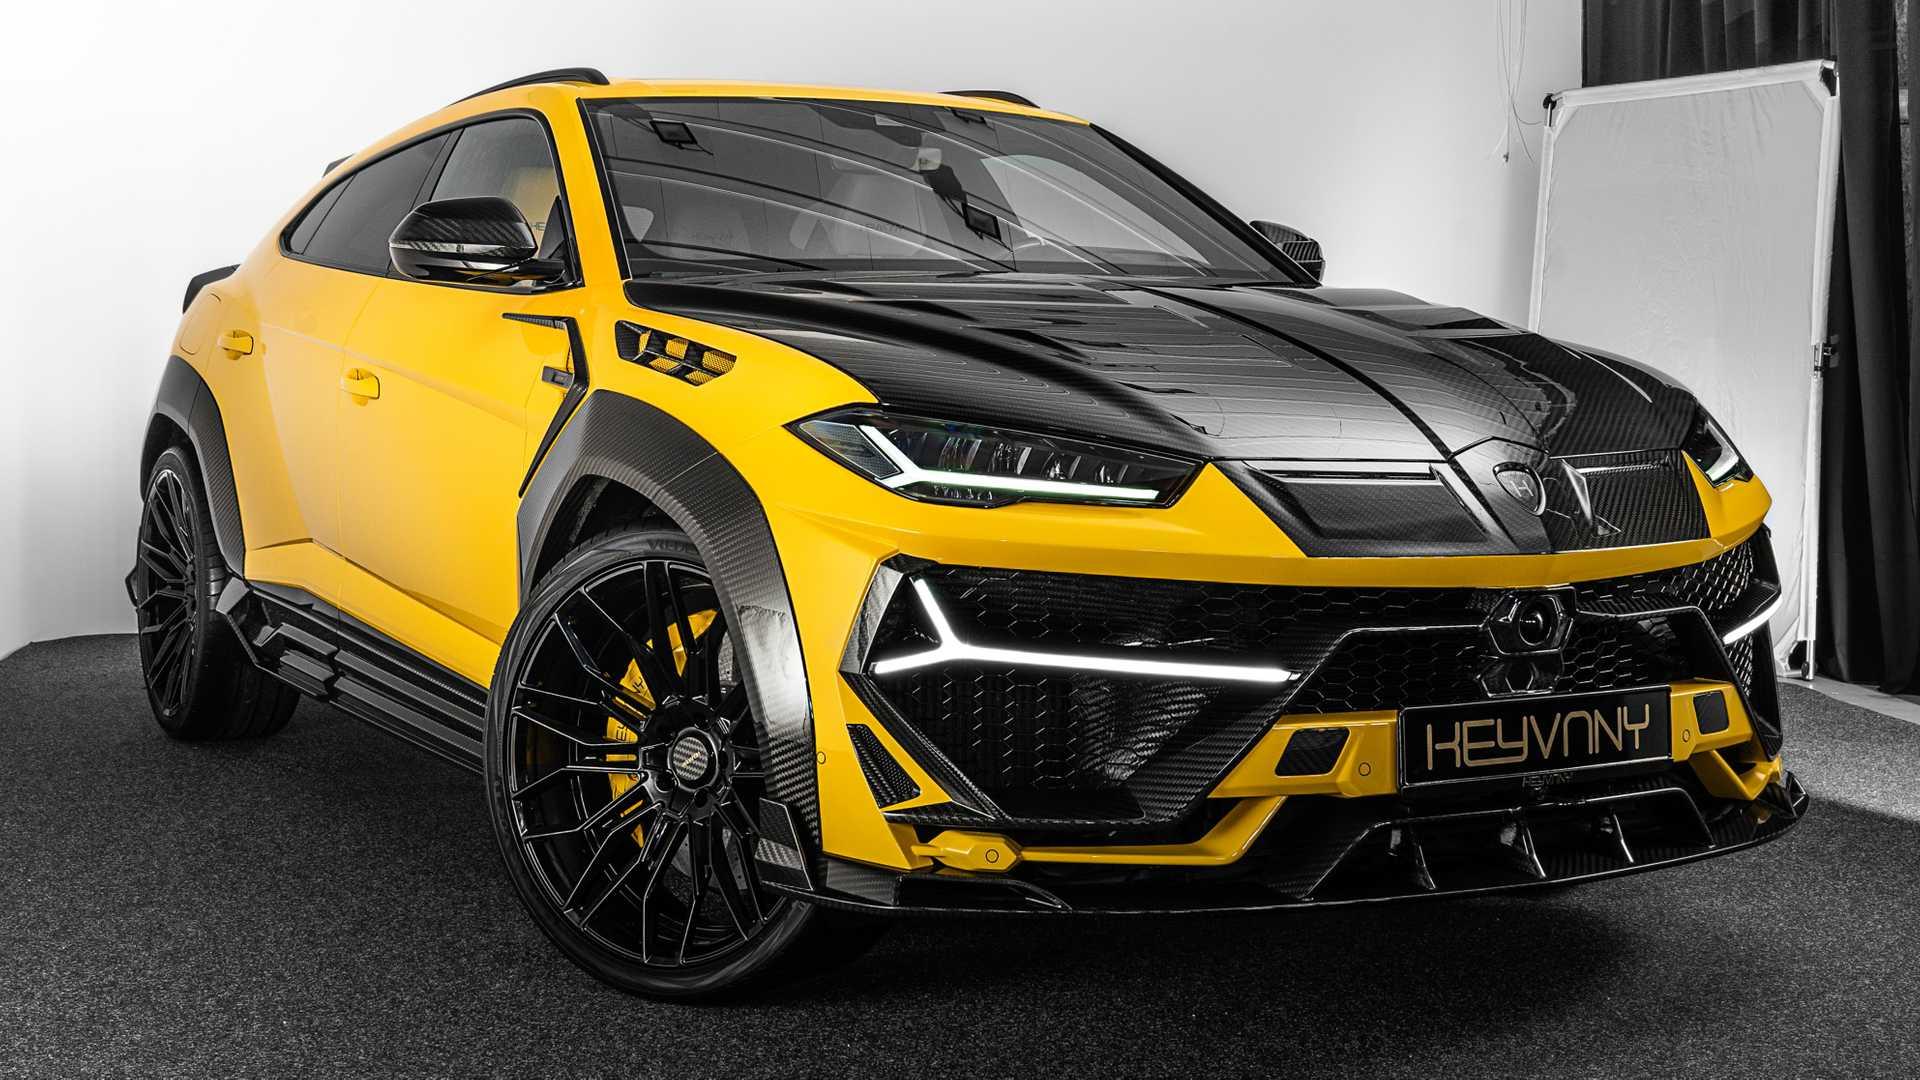 Lamborghini-Urus-by-Keyvany-2